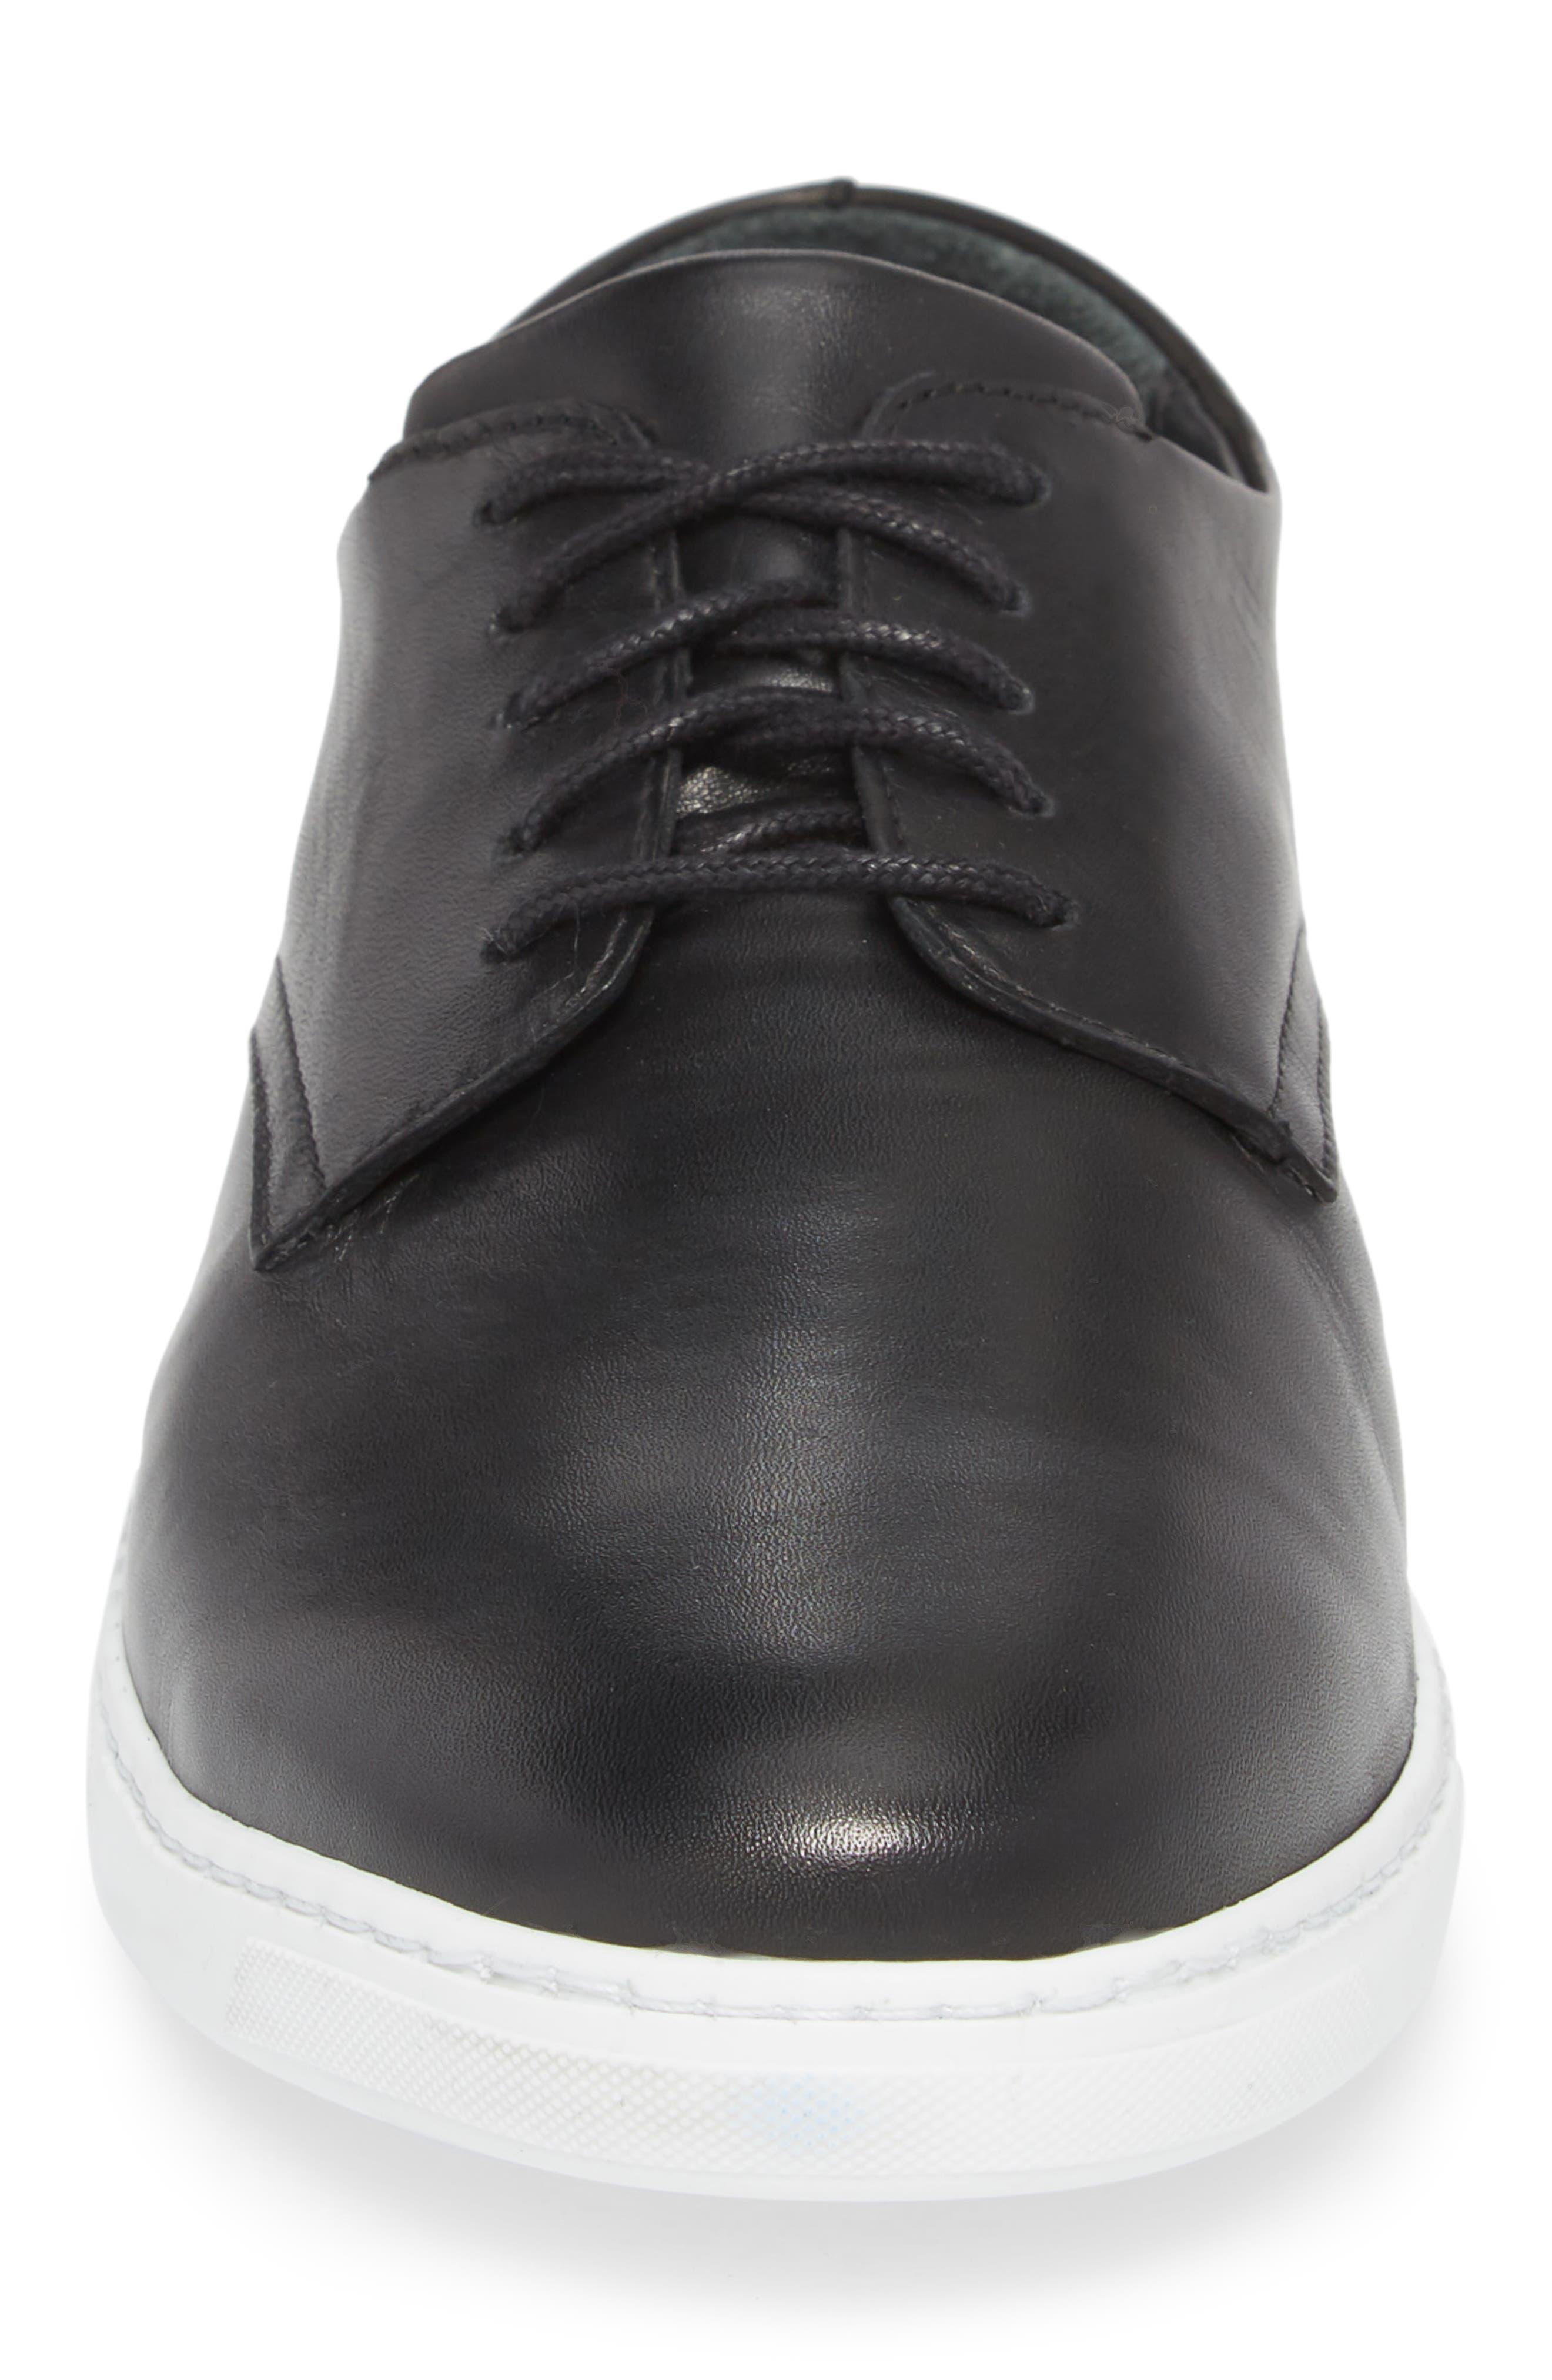 Nok Derby Sneaker,                             Alternate thumbnail 4, color,                             BLACK LEATHER